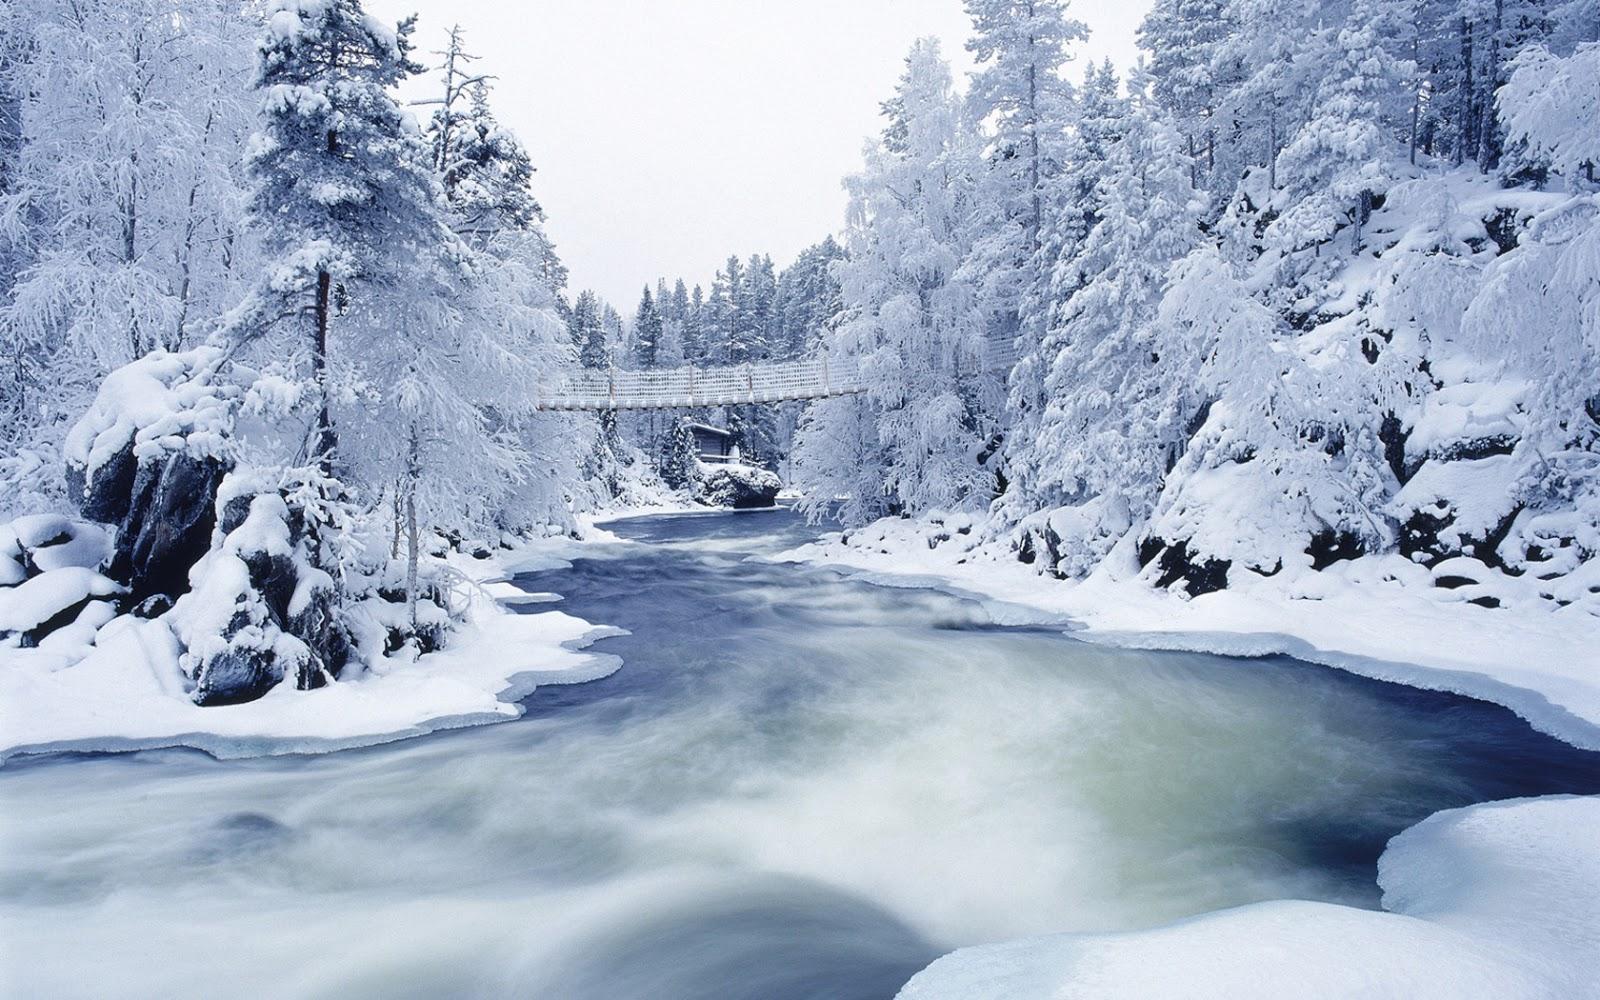 amazing snow wallpaper joseph - photo #15